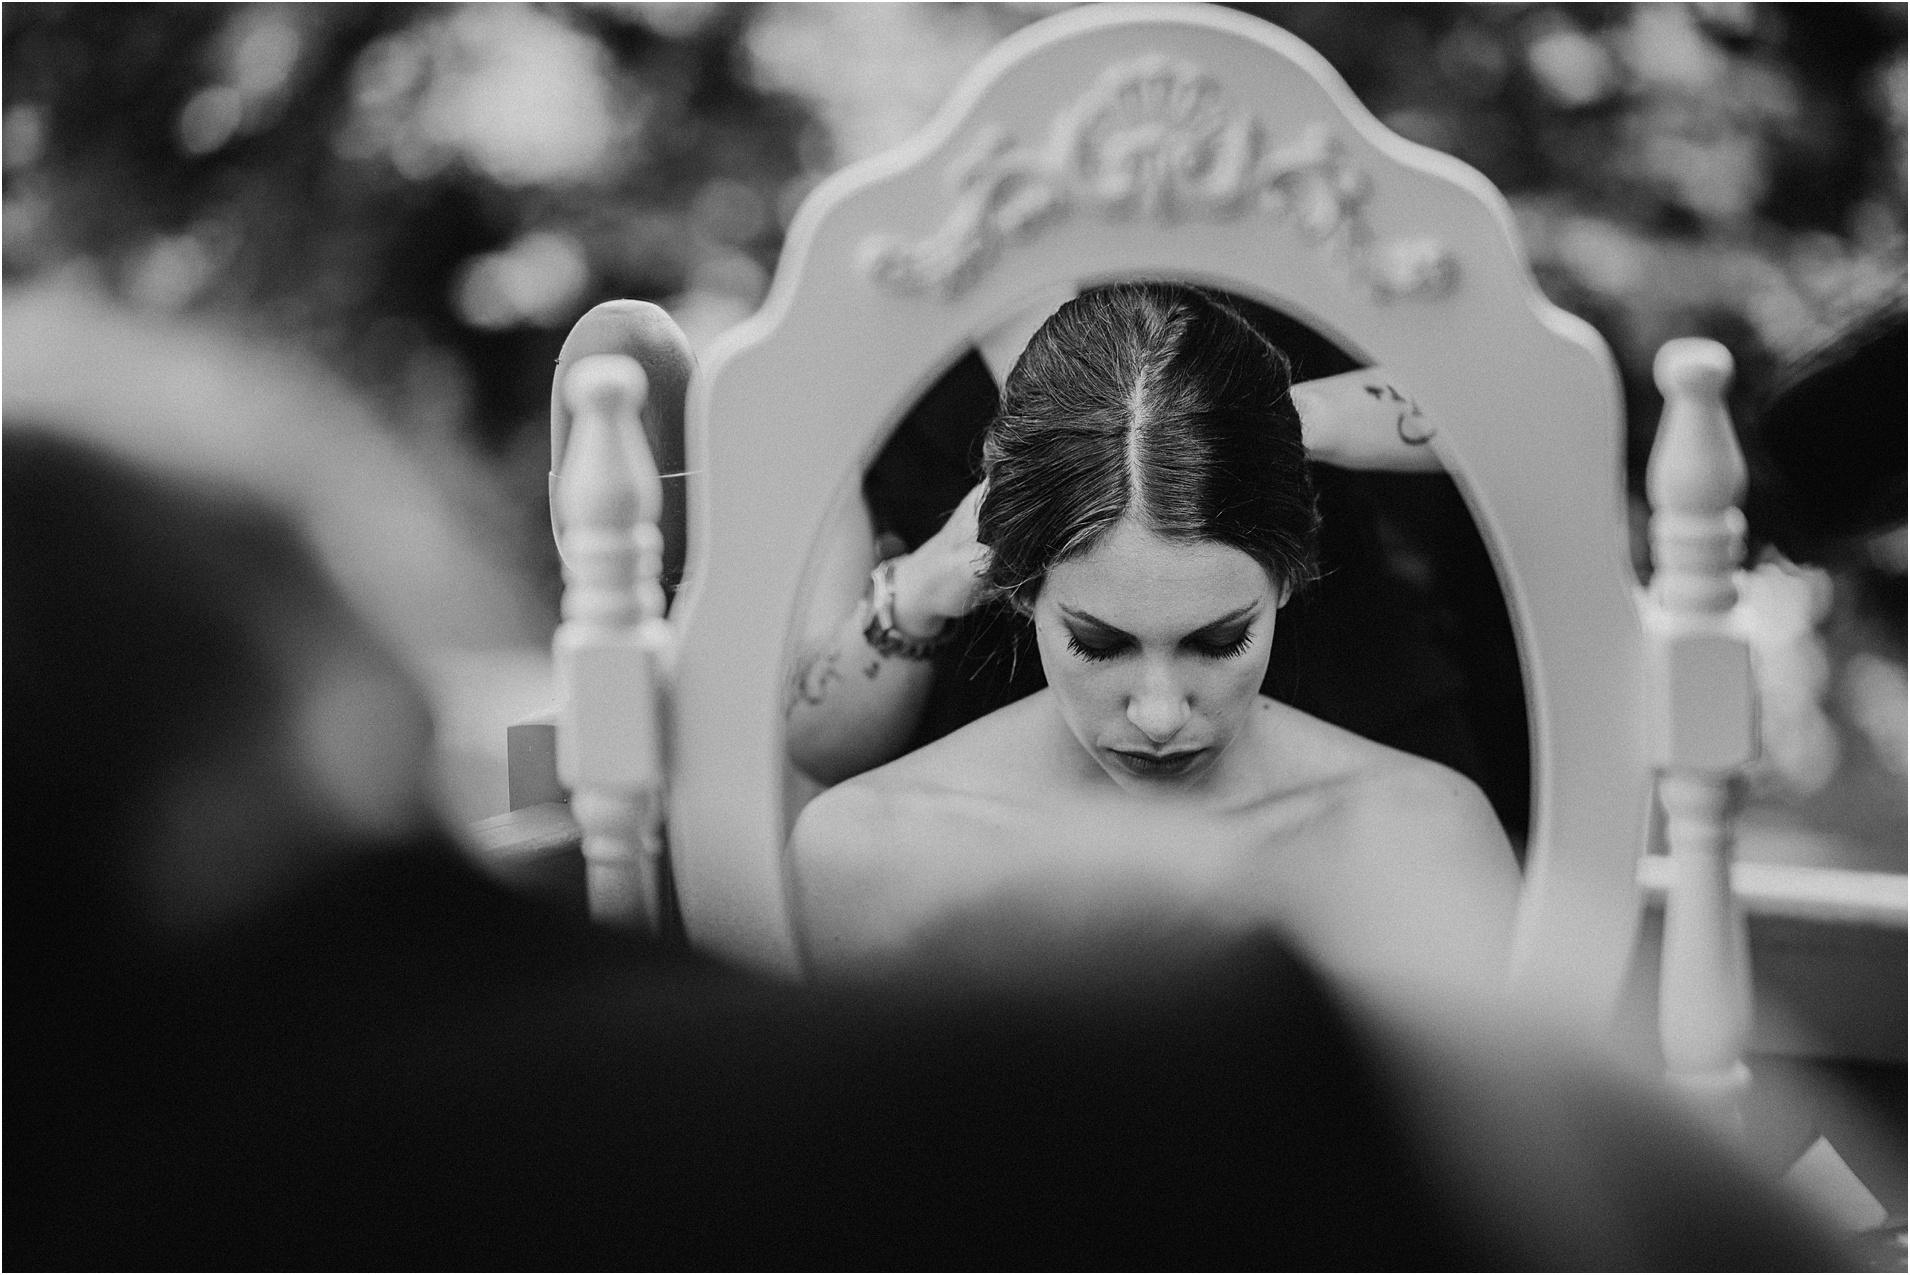 Fotografía y video en Palacio de Arbaisenea Bodas San Sebastián Donostia Guipuzcoa - Finca Arbaisenea by Maher Catering Wedding films and photography-23.jpg